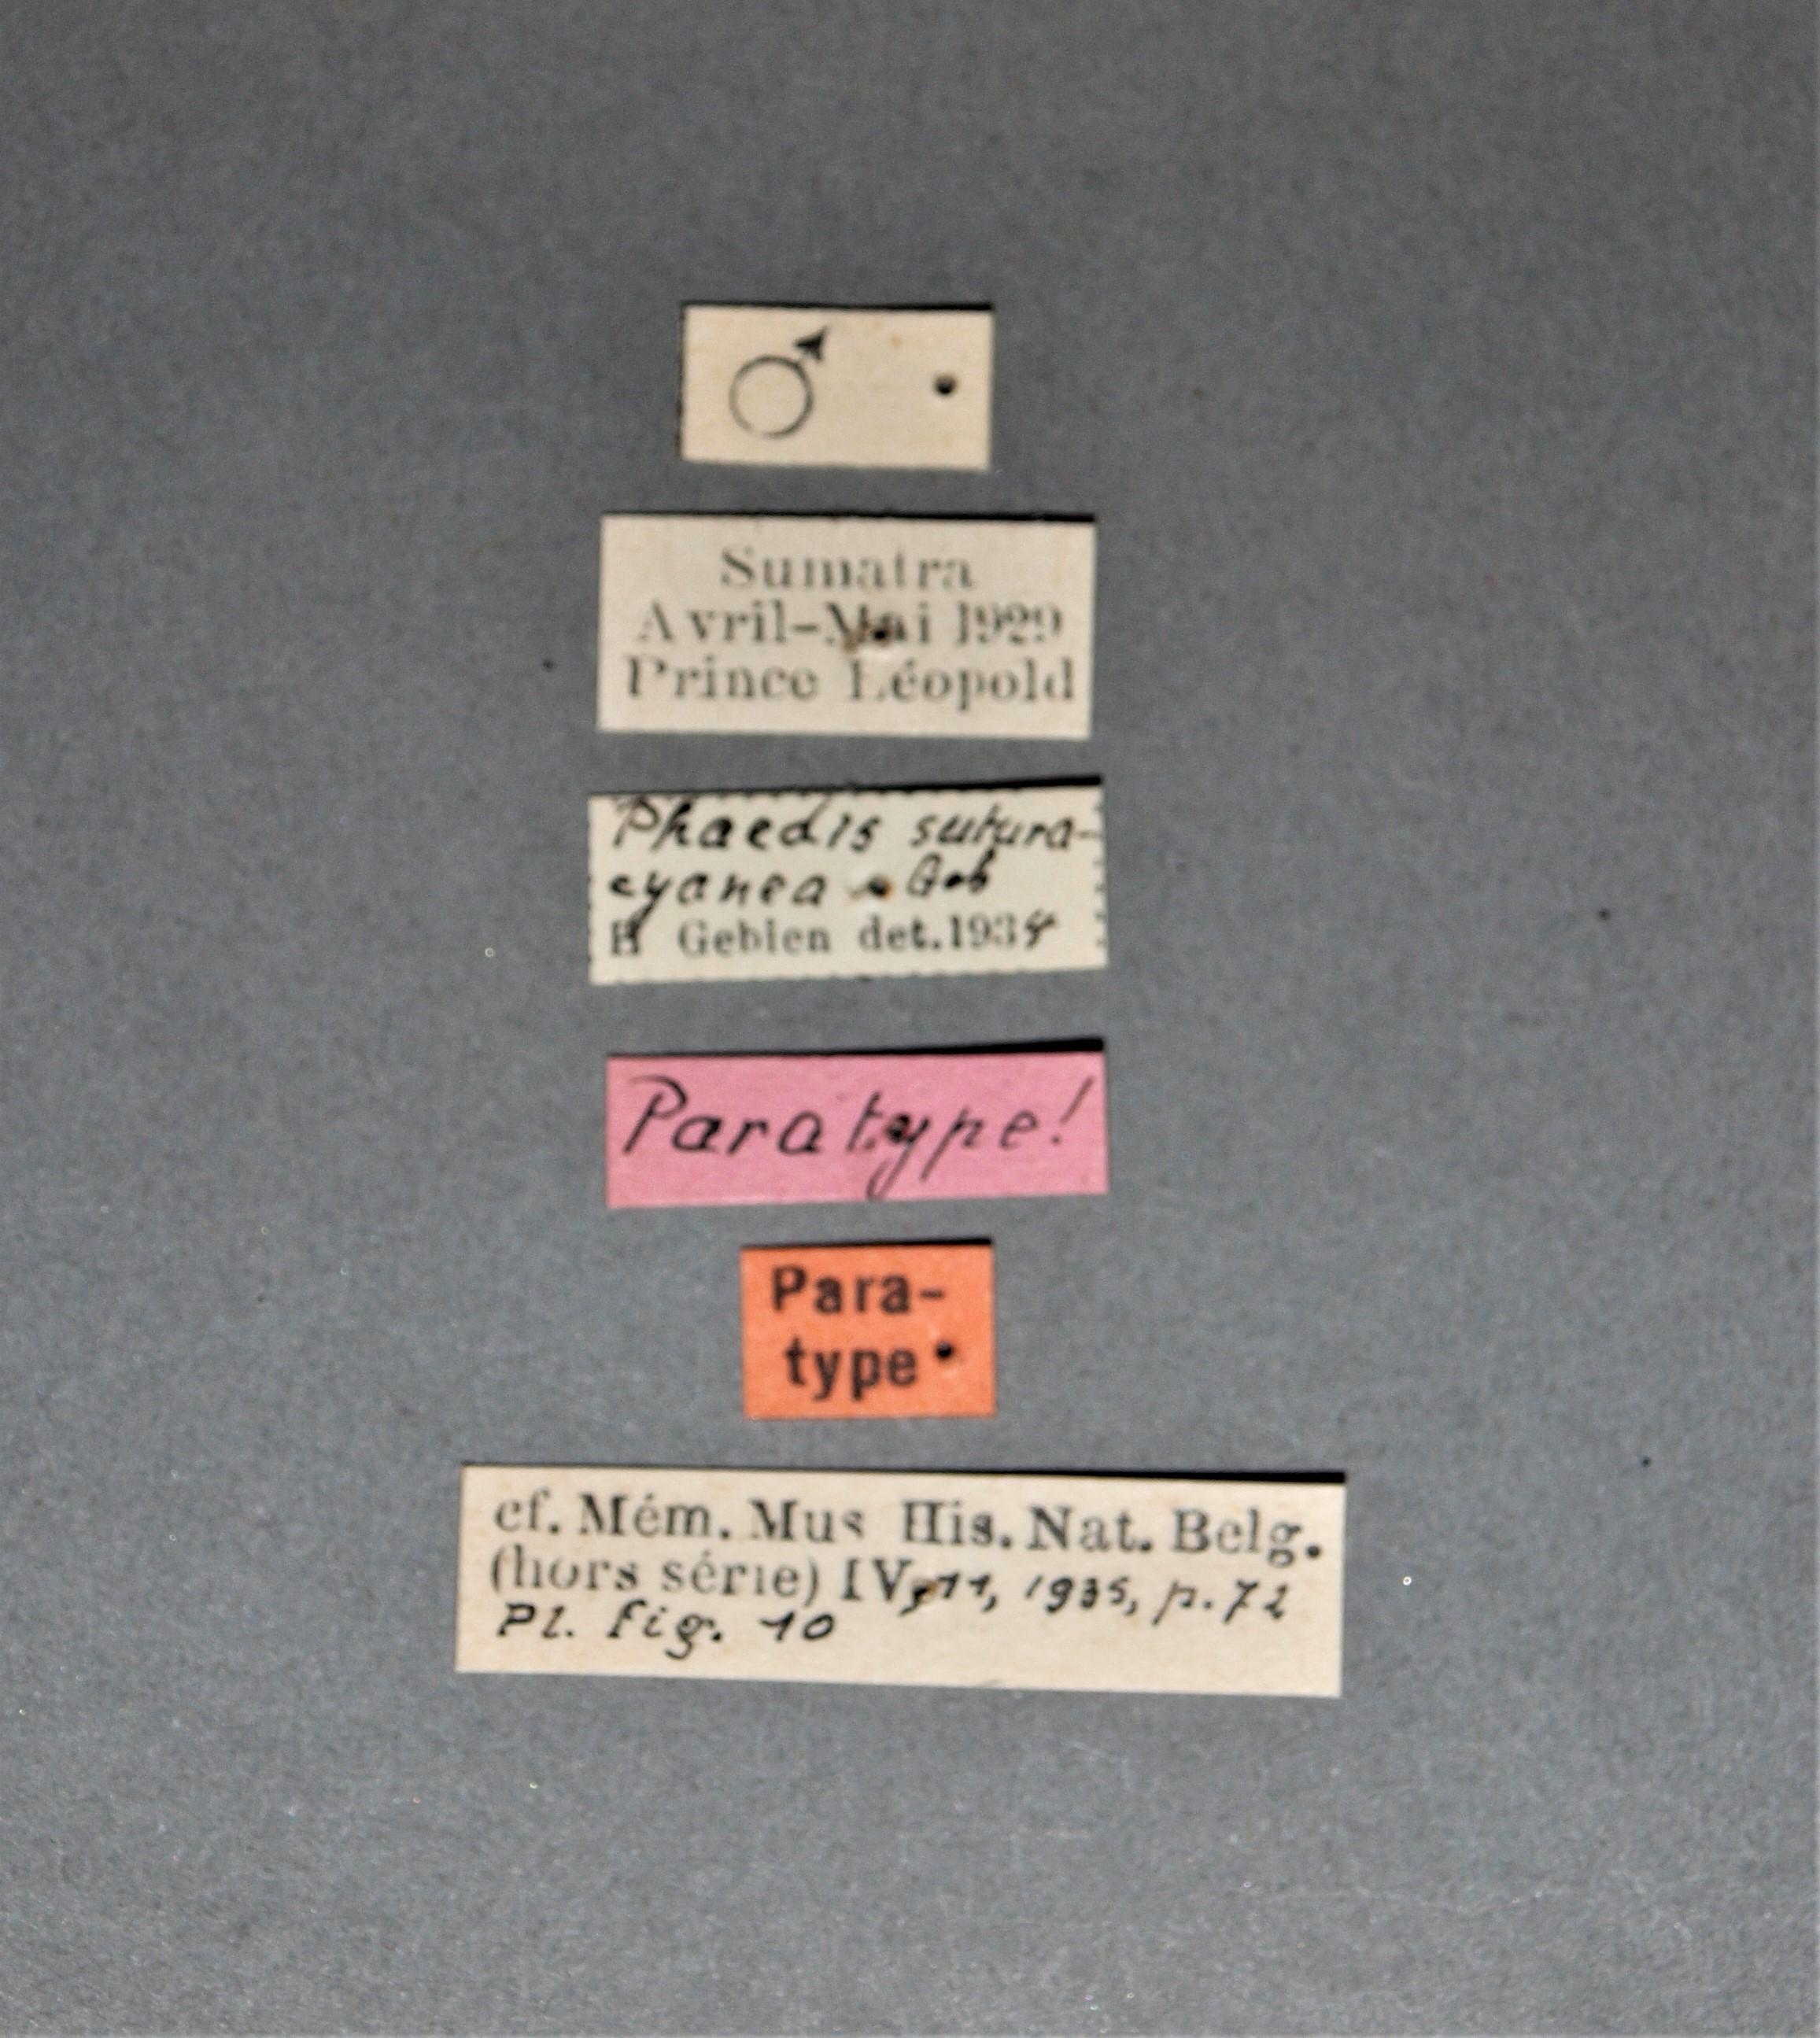 Phaedis suturacyanea pt.JPG